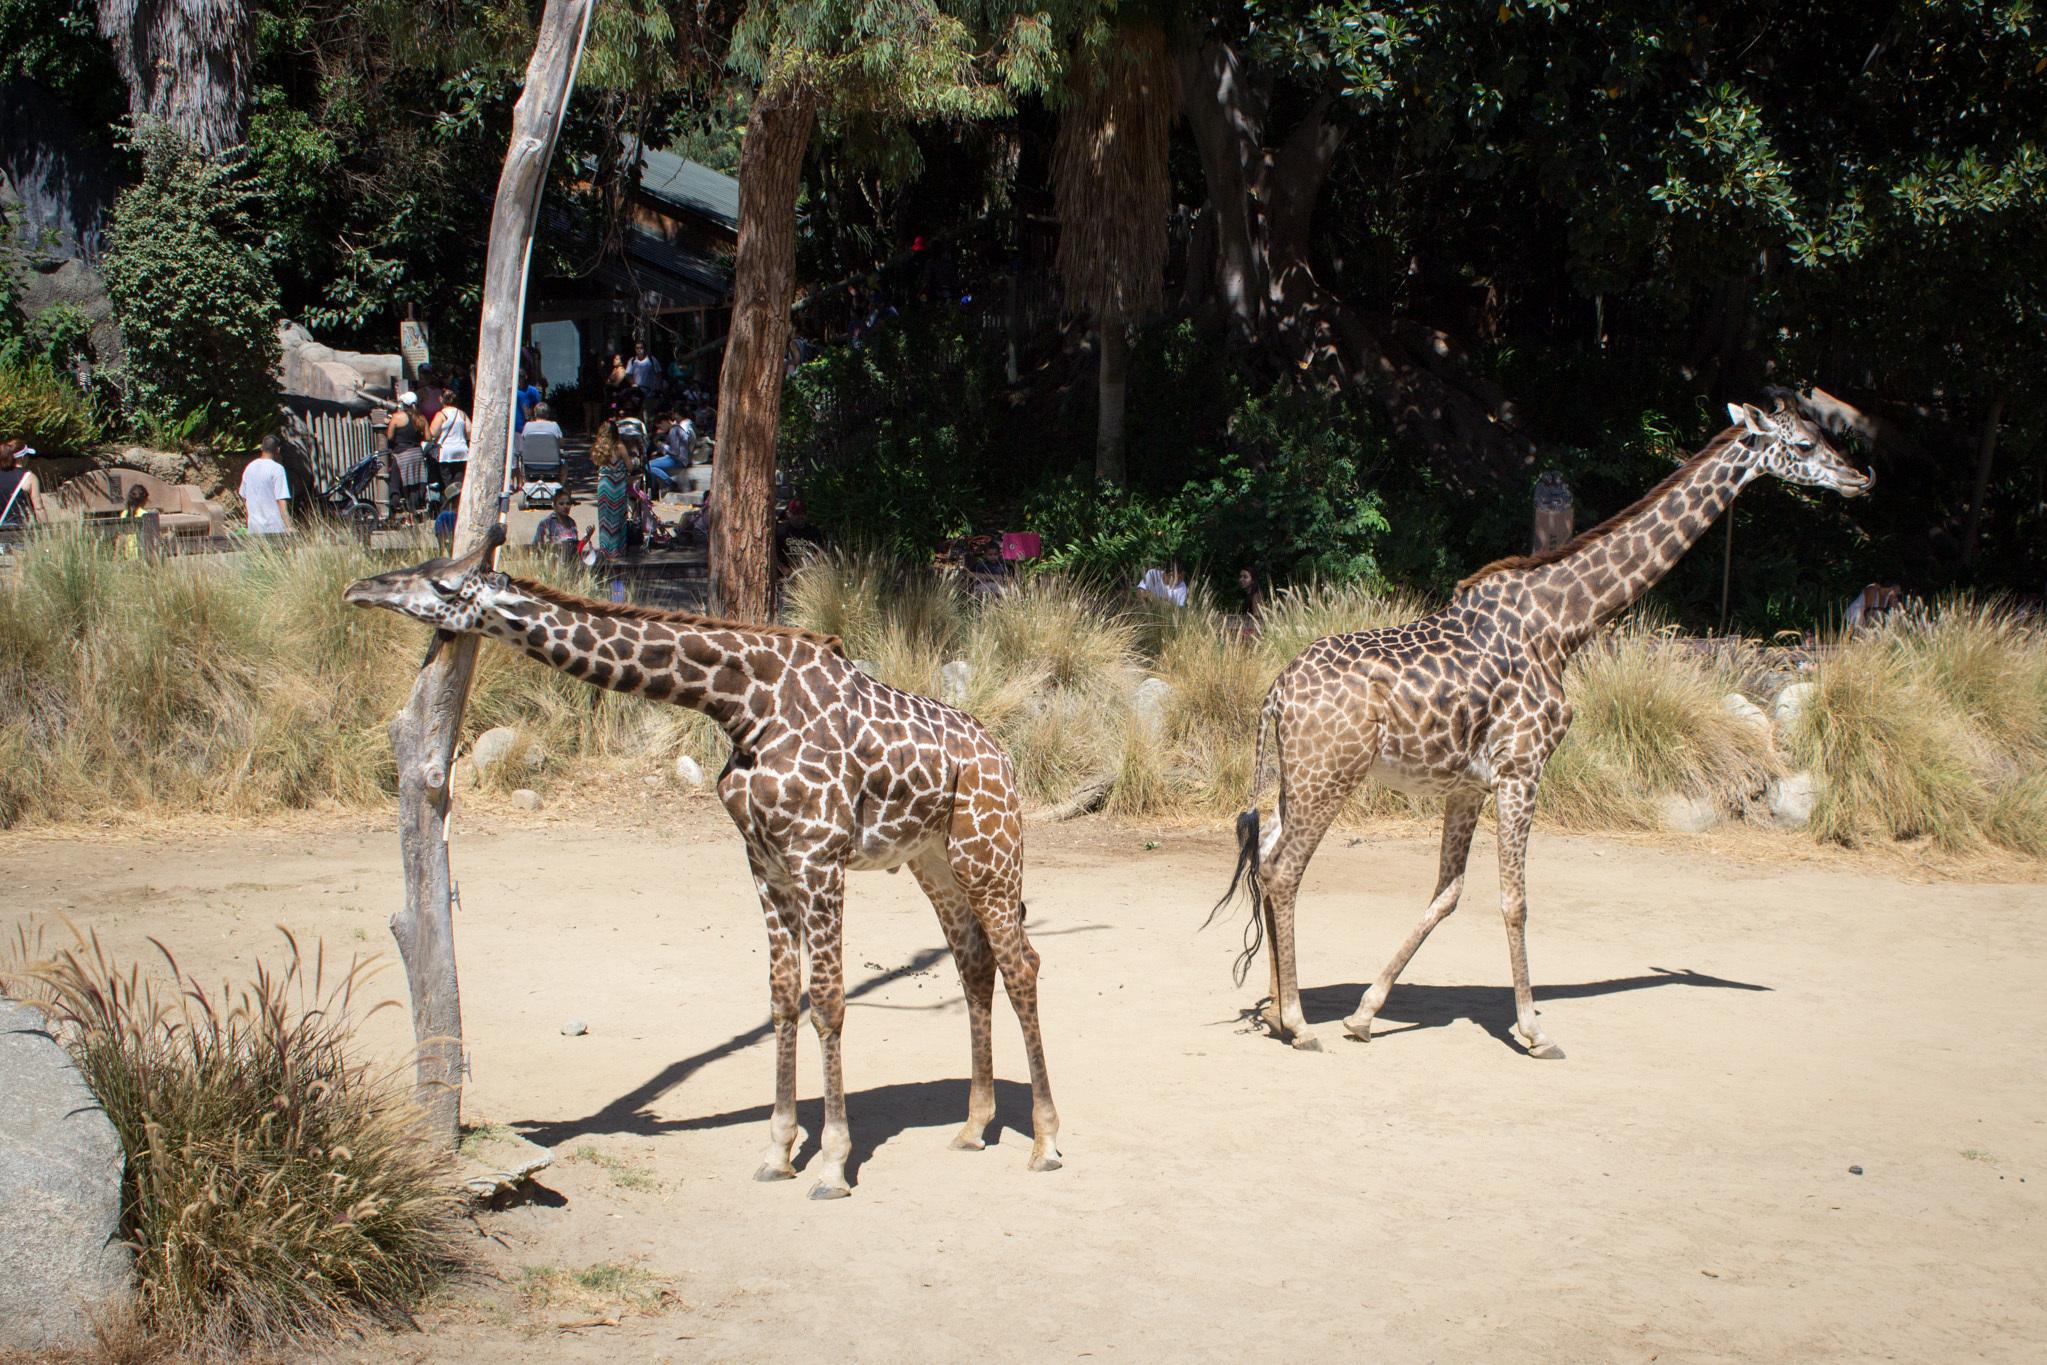 Los Angeles Zoo.